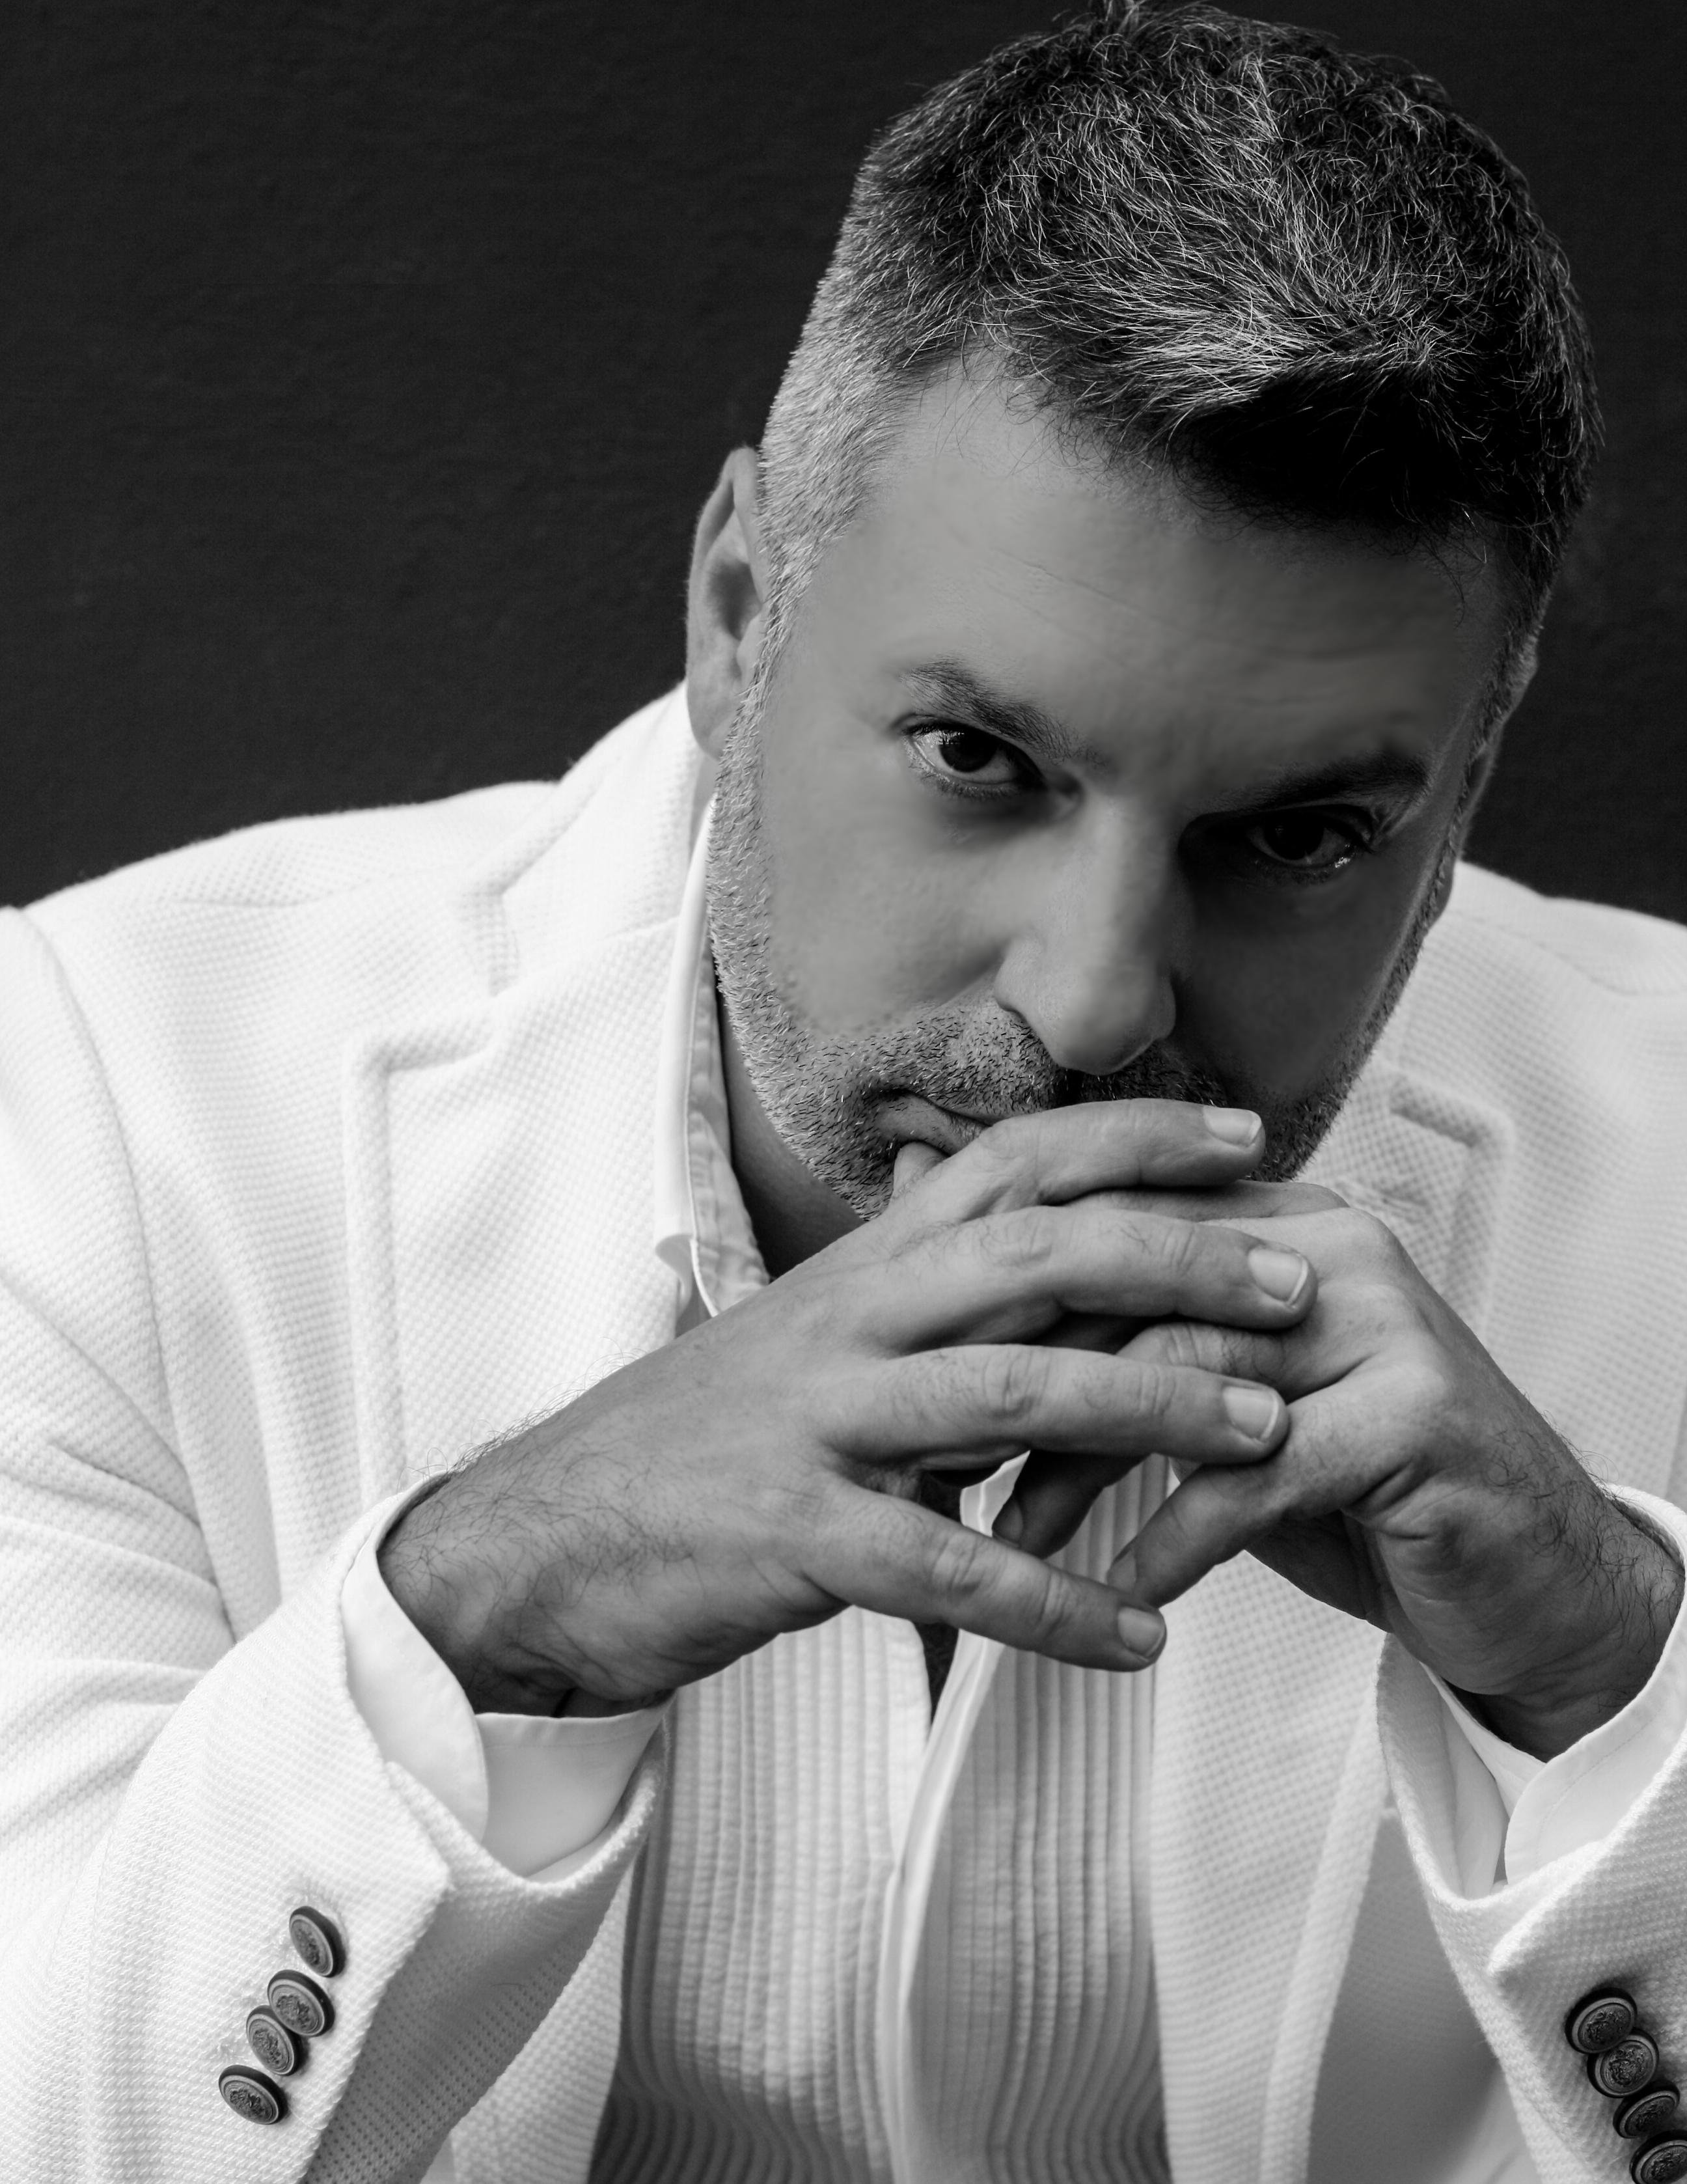 David Menéndez